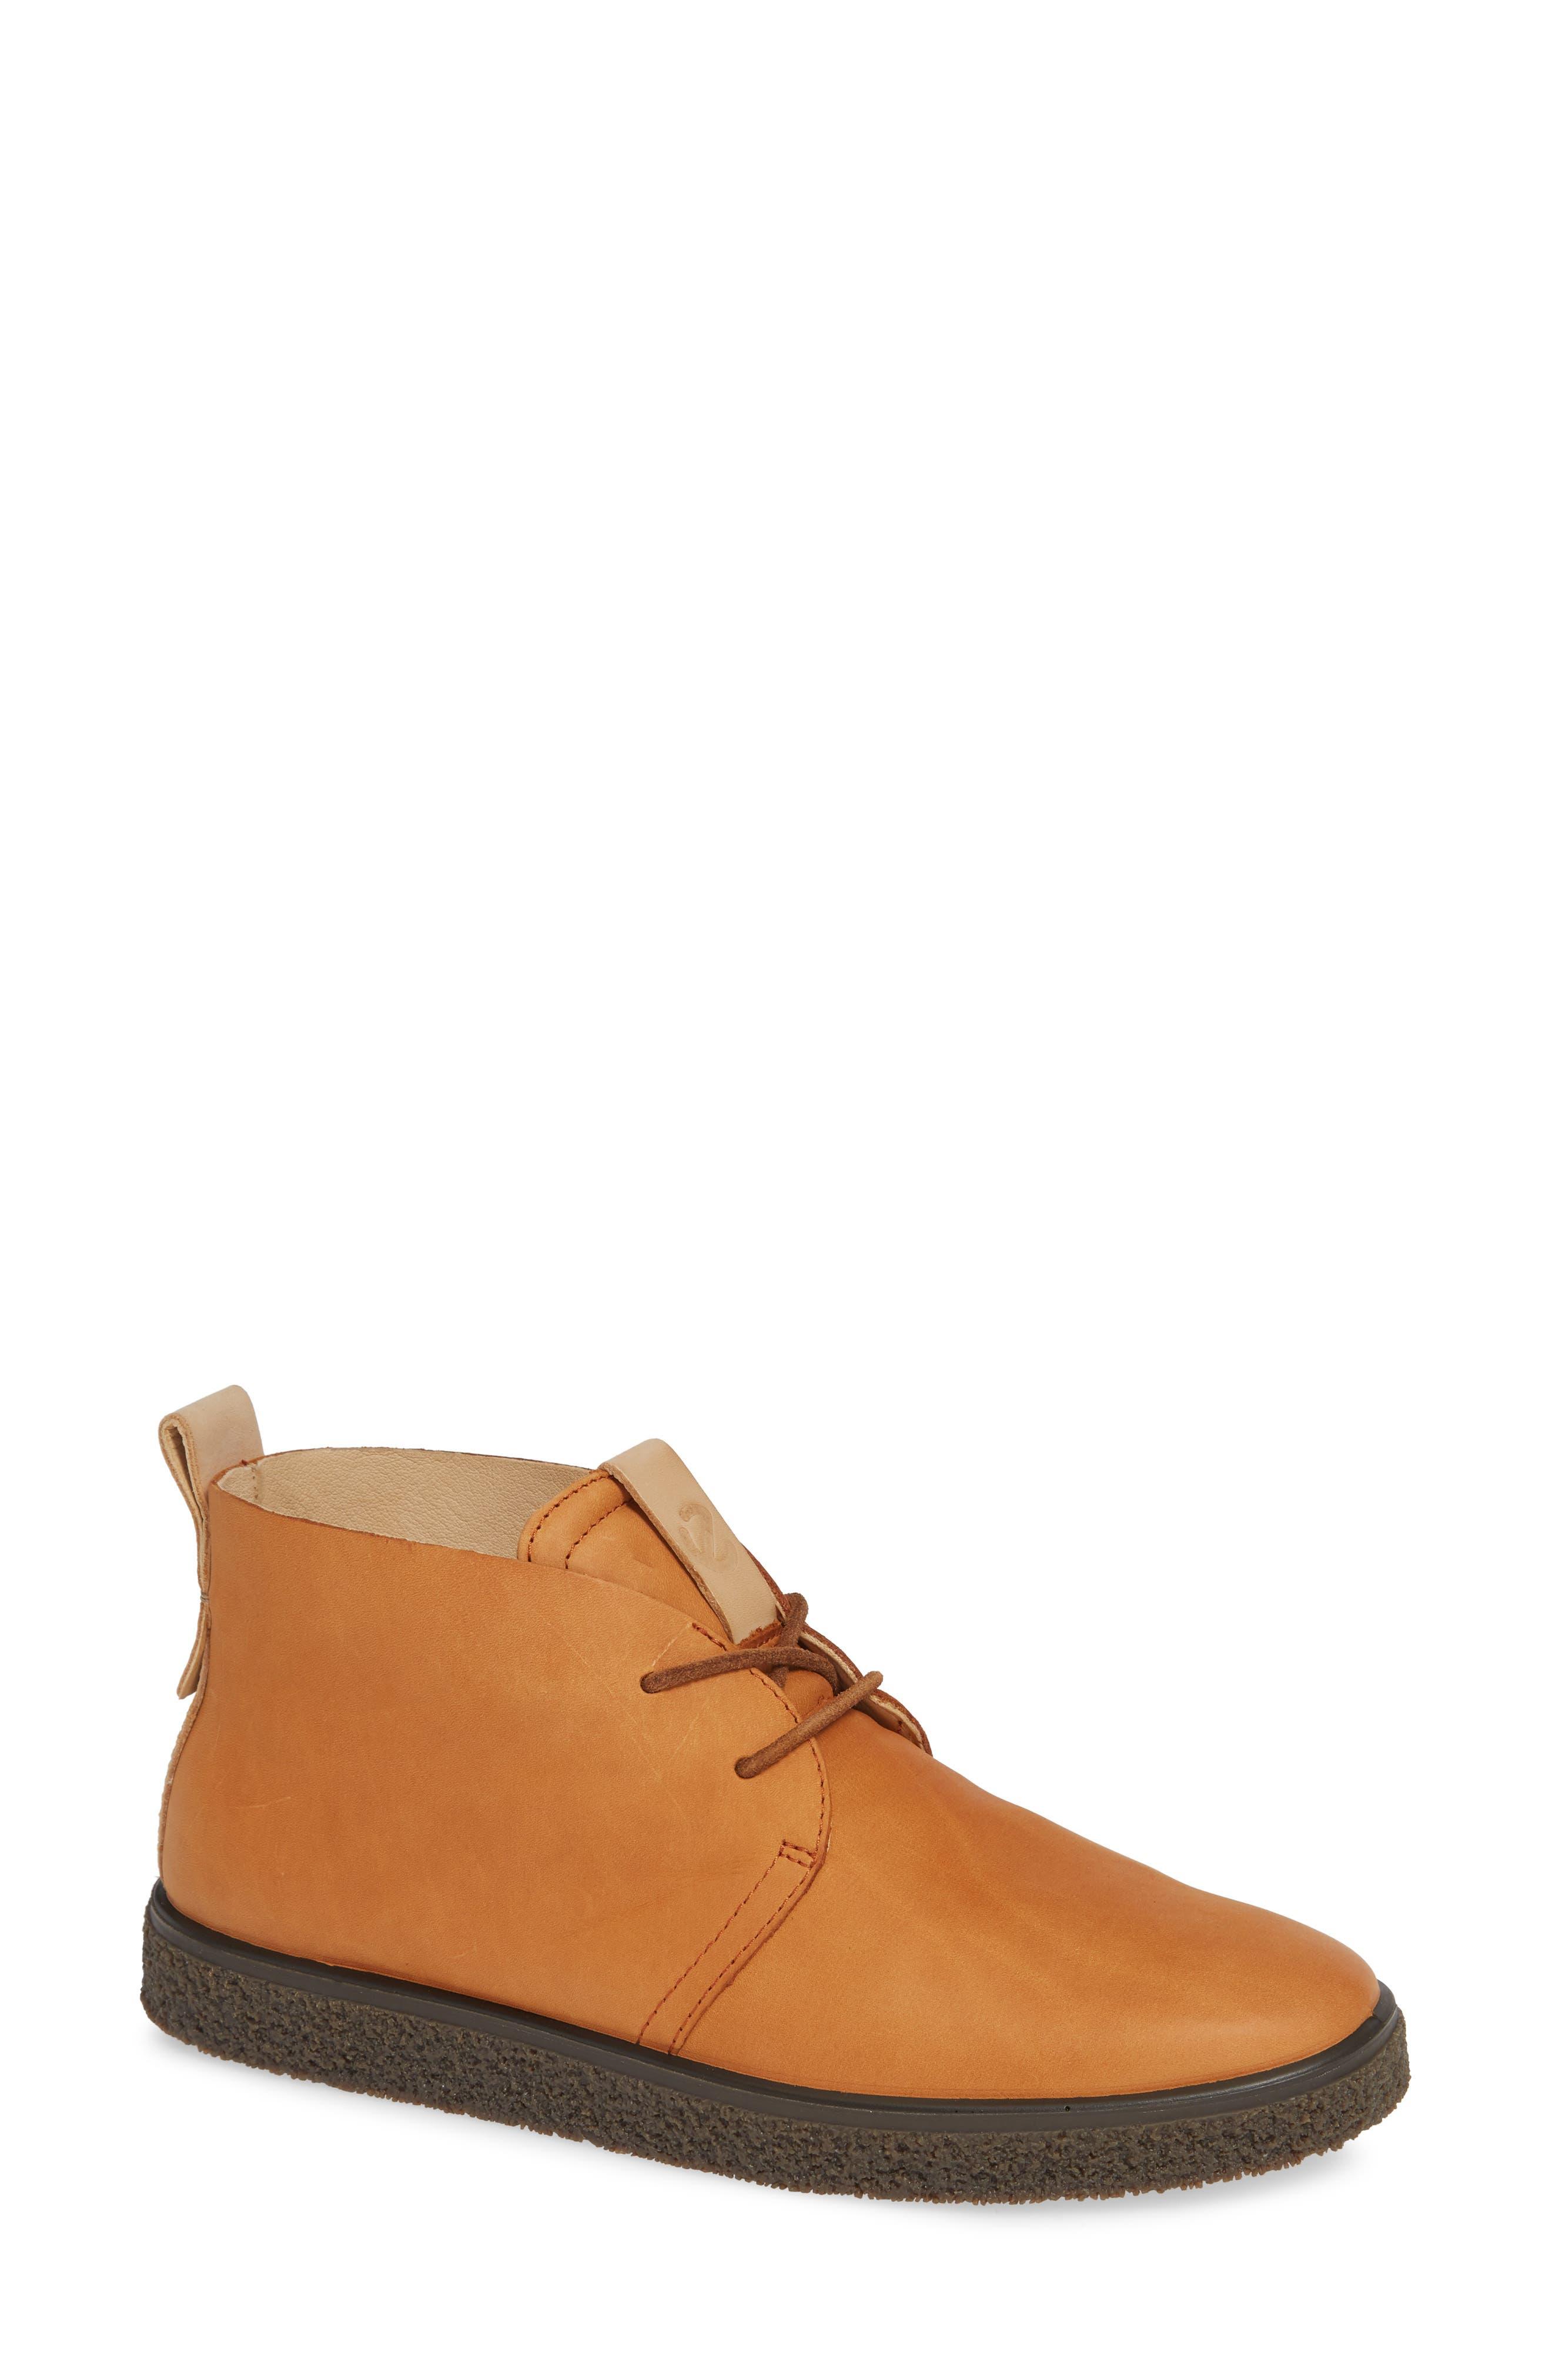 Ecco Crepetray Chukka Boot, Brown